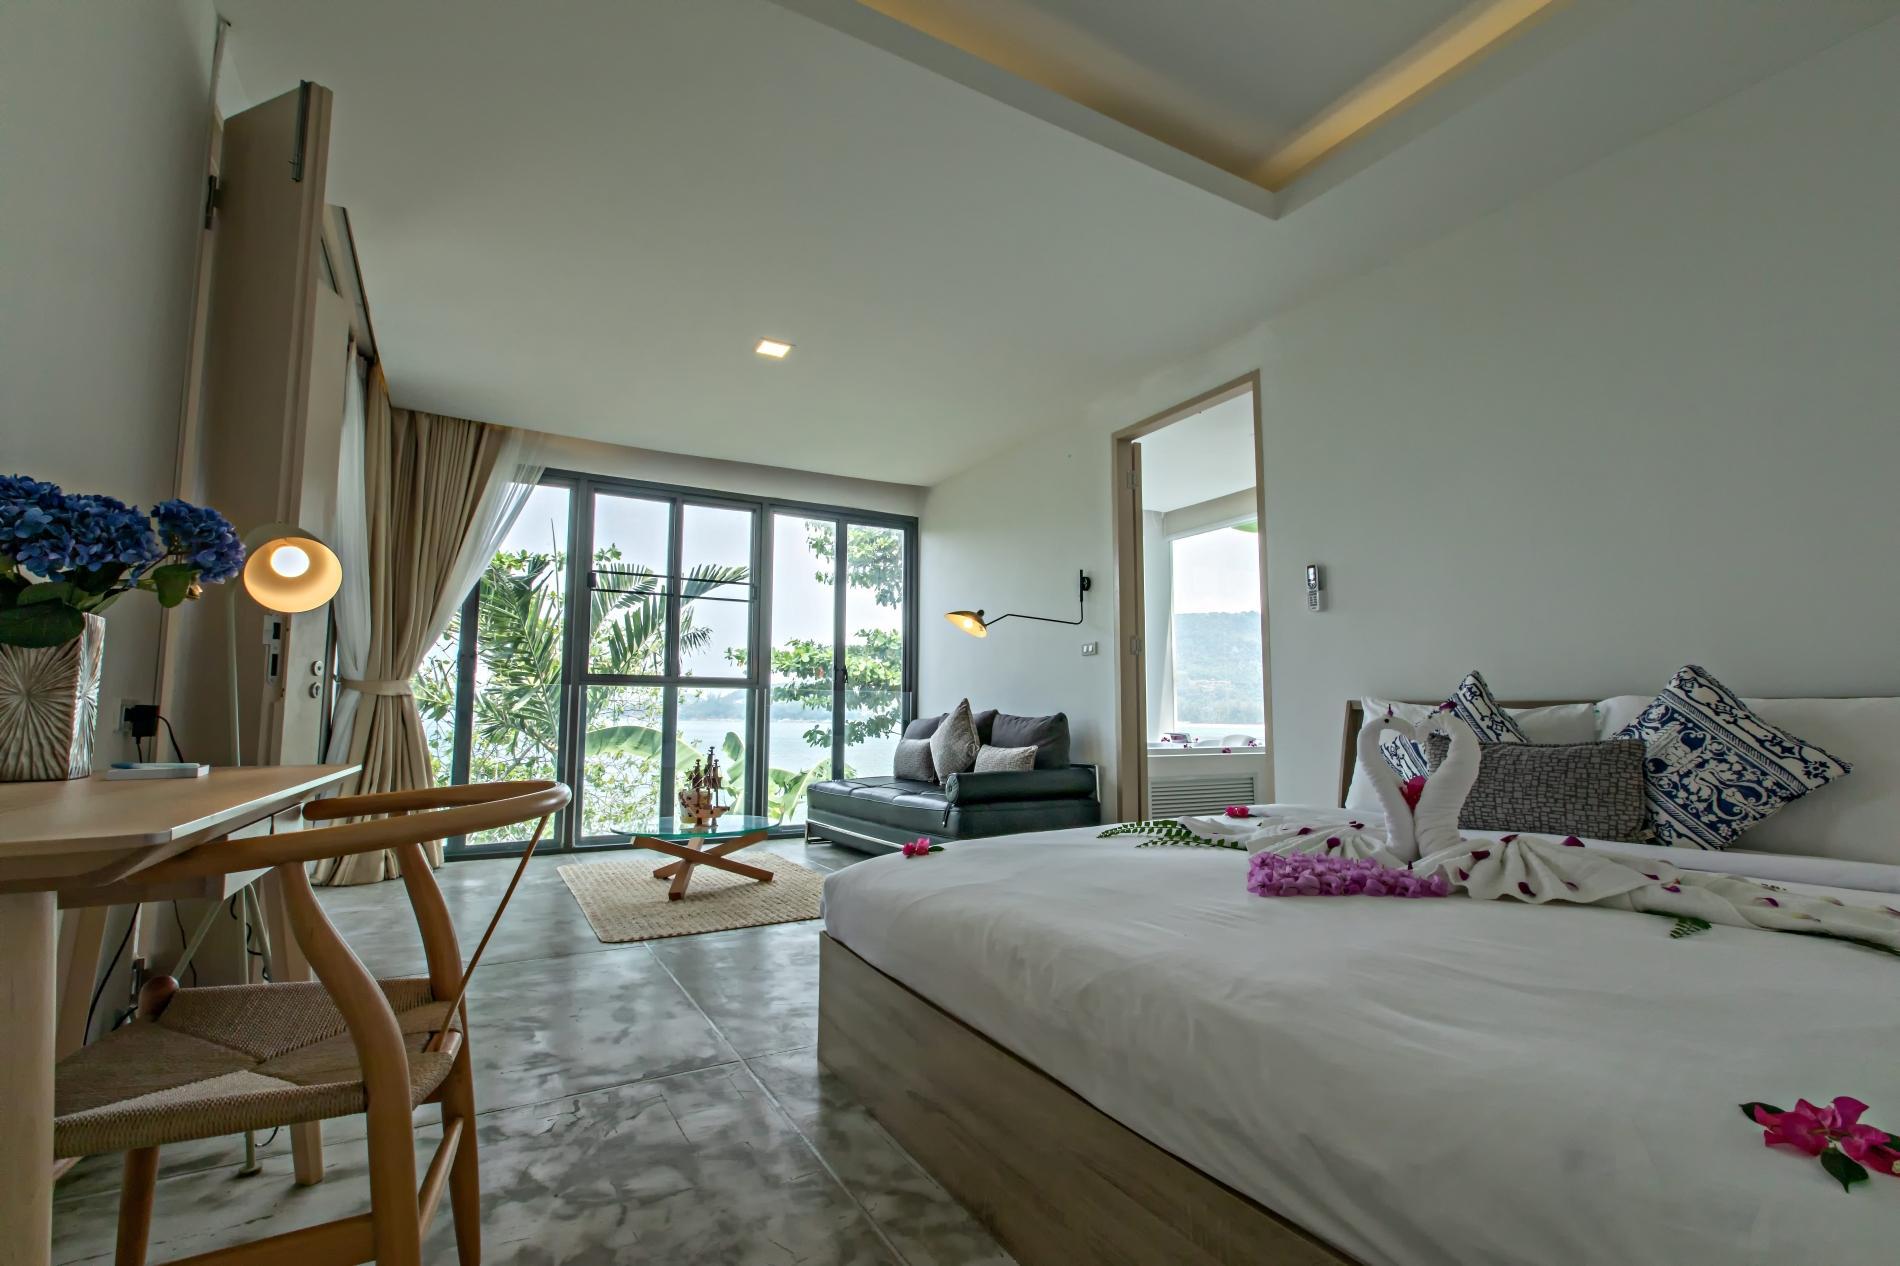 Apartment Beachfront and seaview apartment for 4 on Kamala - KBE photo 19383508